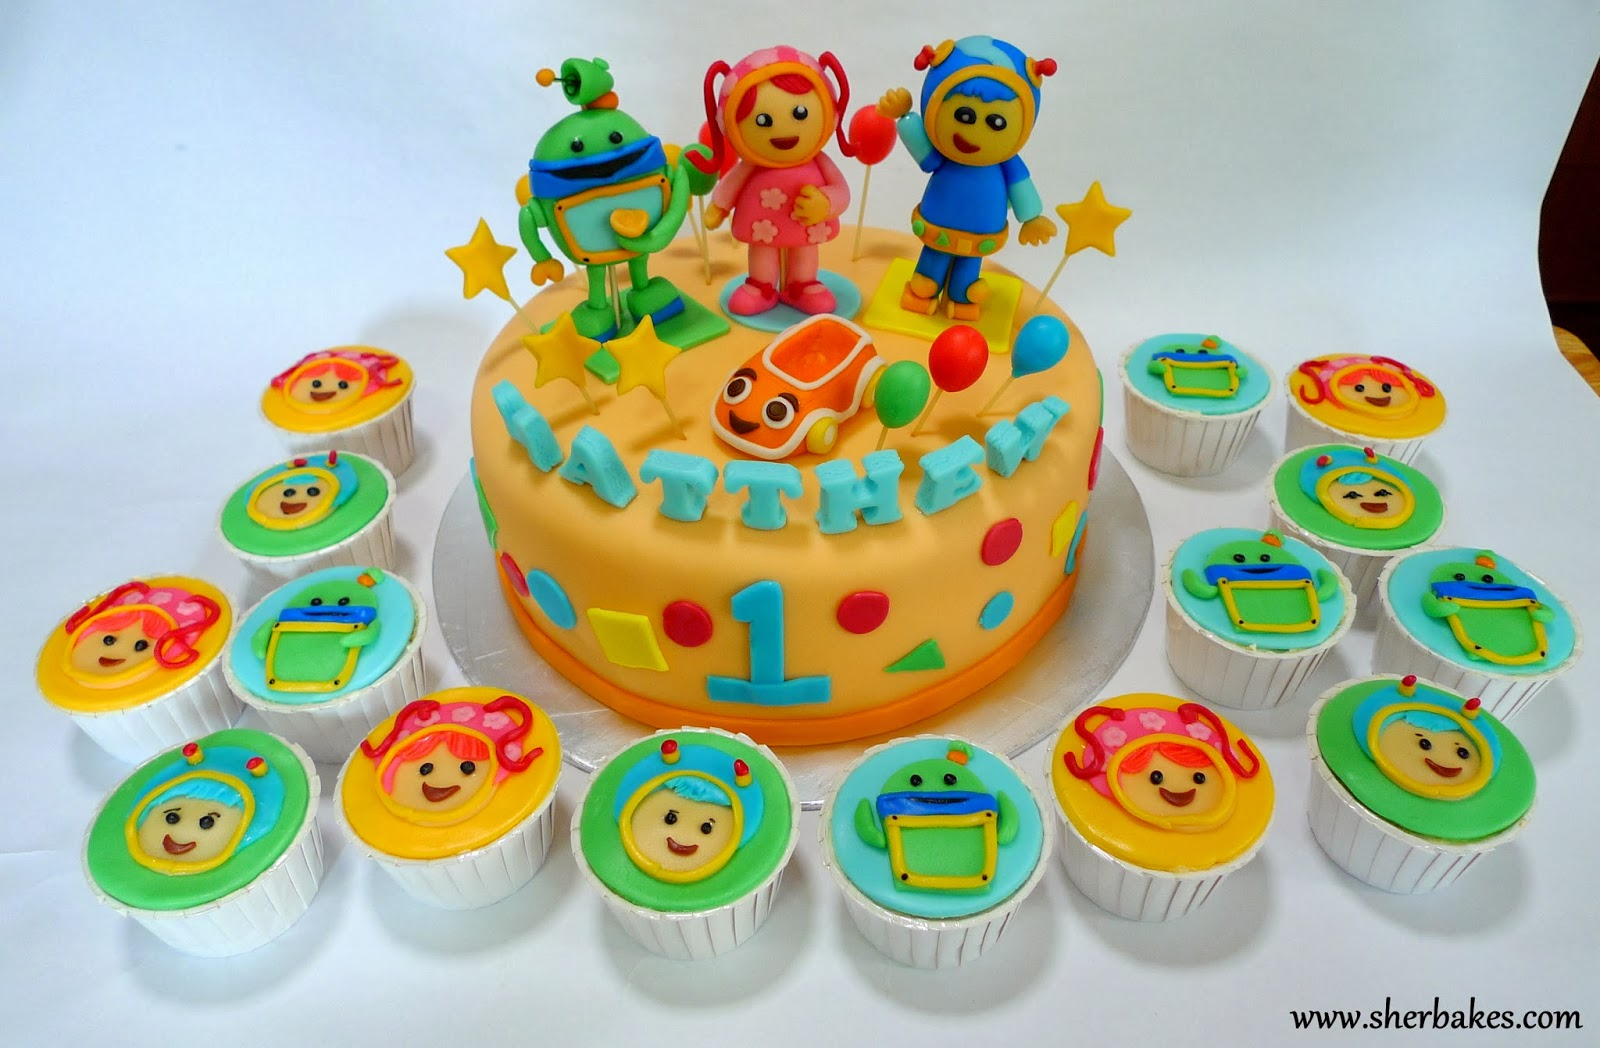 Team Umizoomi Cake and CupcakesTeam Umizoomi Cake